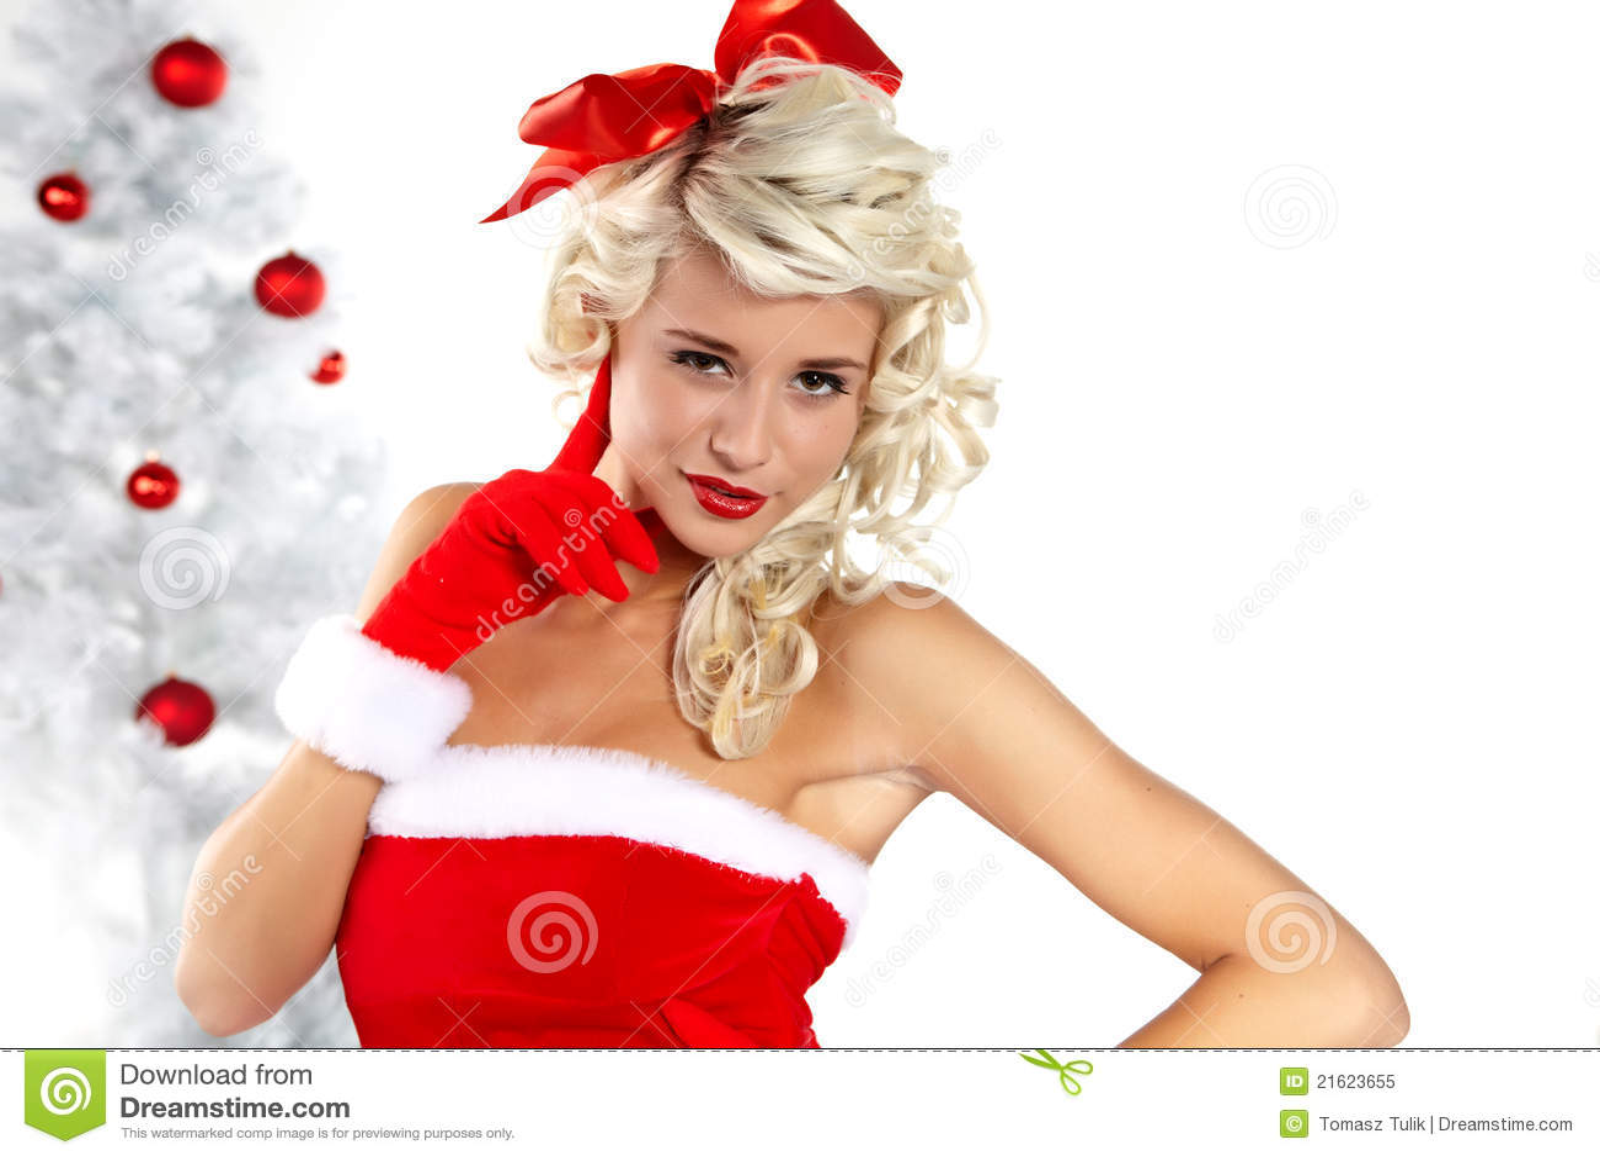 Pin Up Girl Wearing Santa Claus Clothes Stock Image